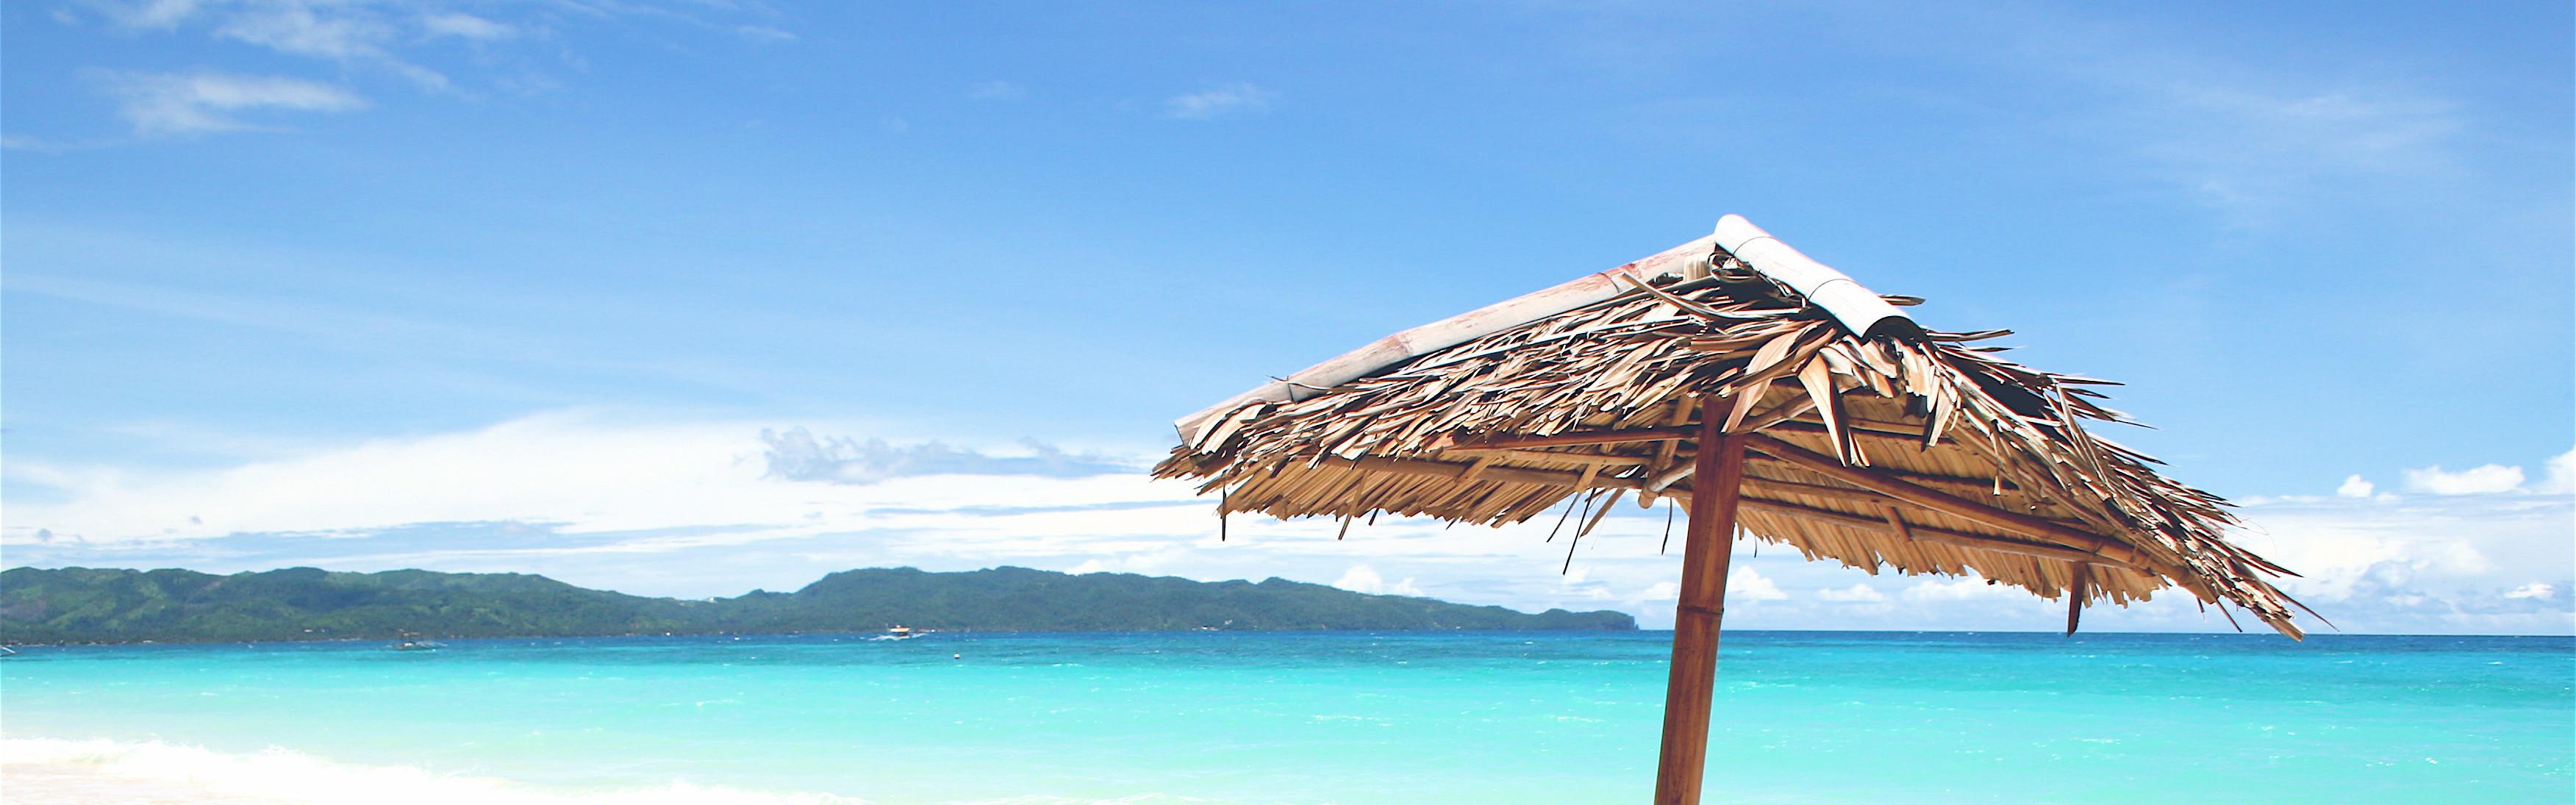 Travel | De 12 Mooiste Stranden ter Wereld